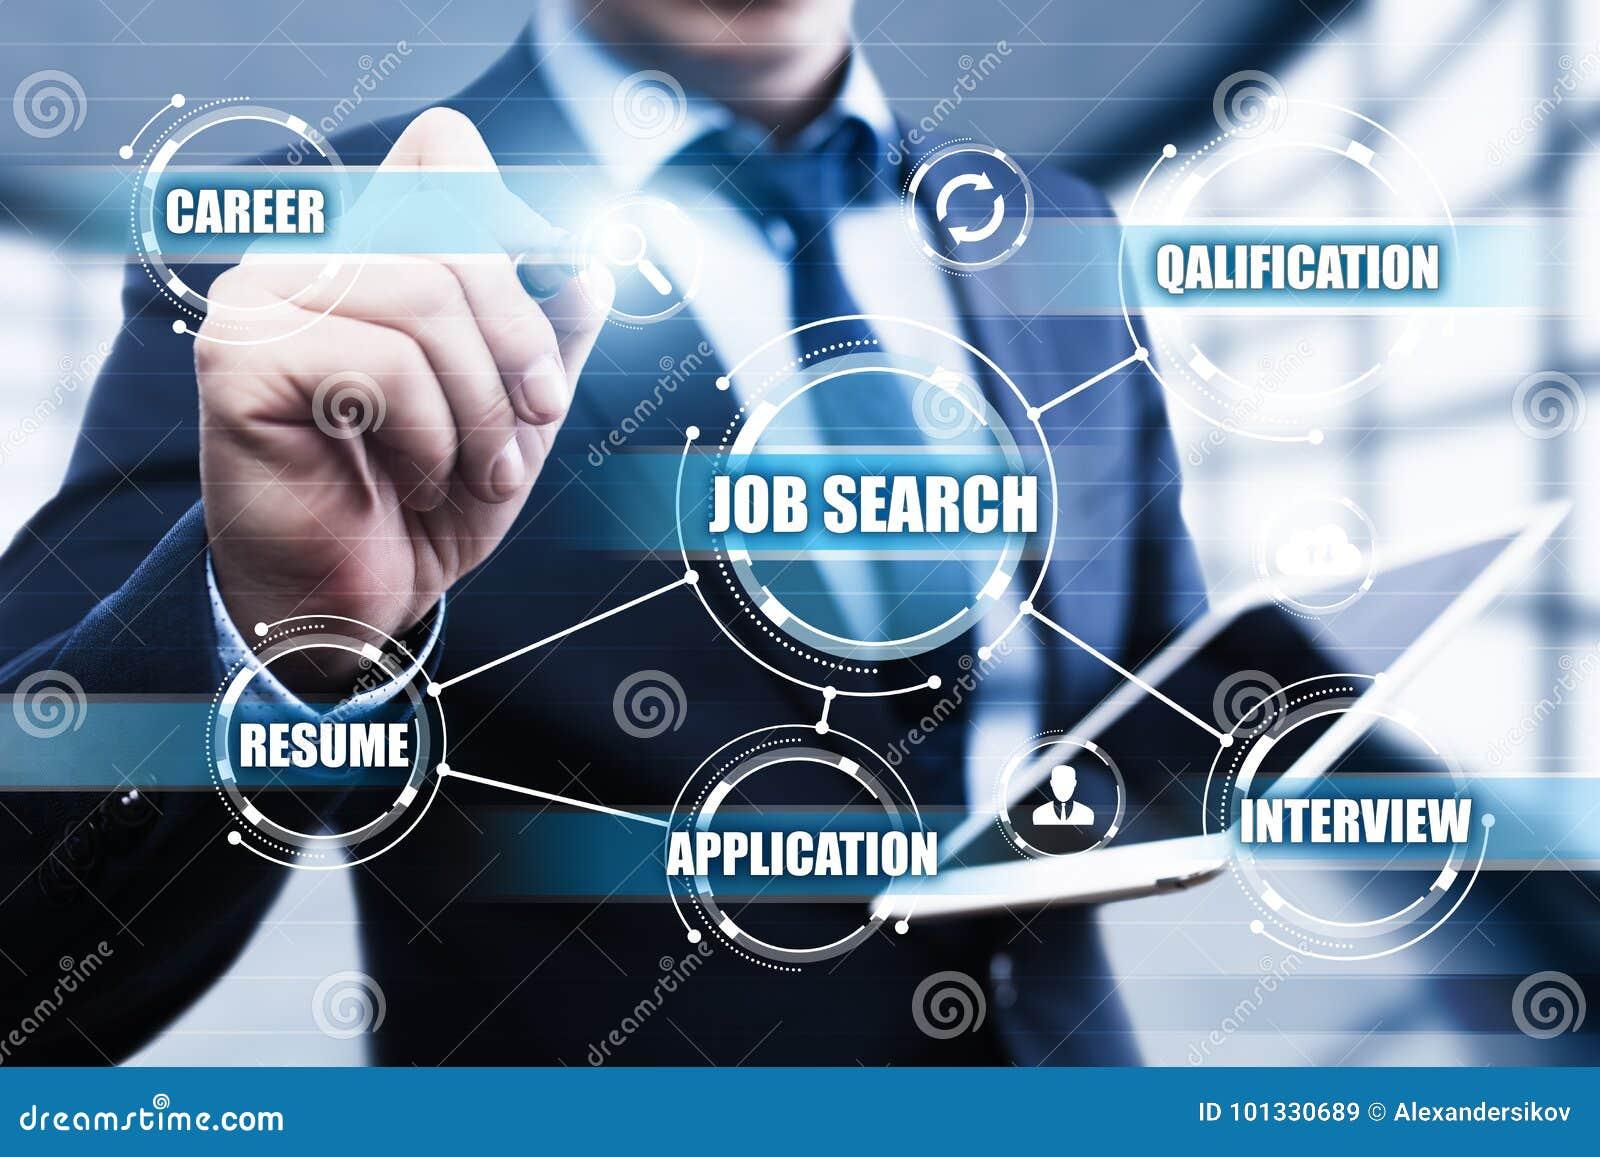 Job Search Human Resources Recruitment-Karriere-Geschäfts-Internet-Technologie-Konzept